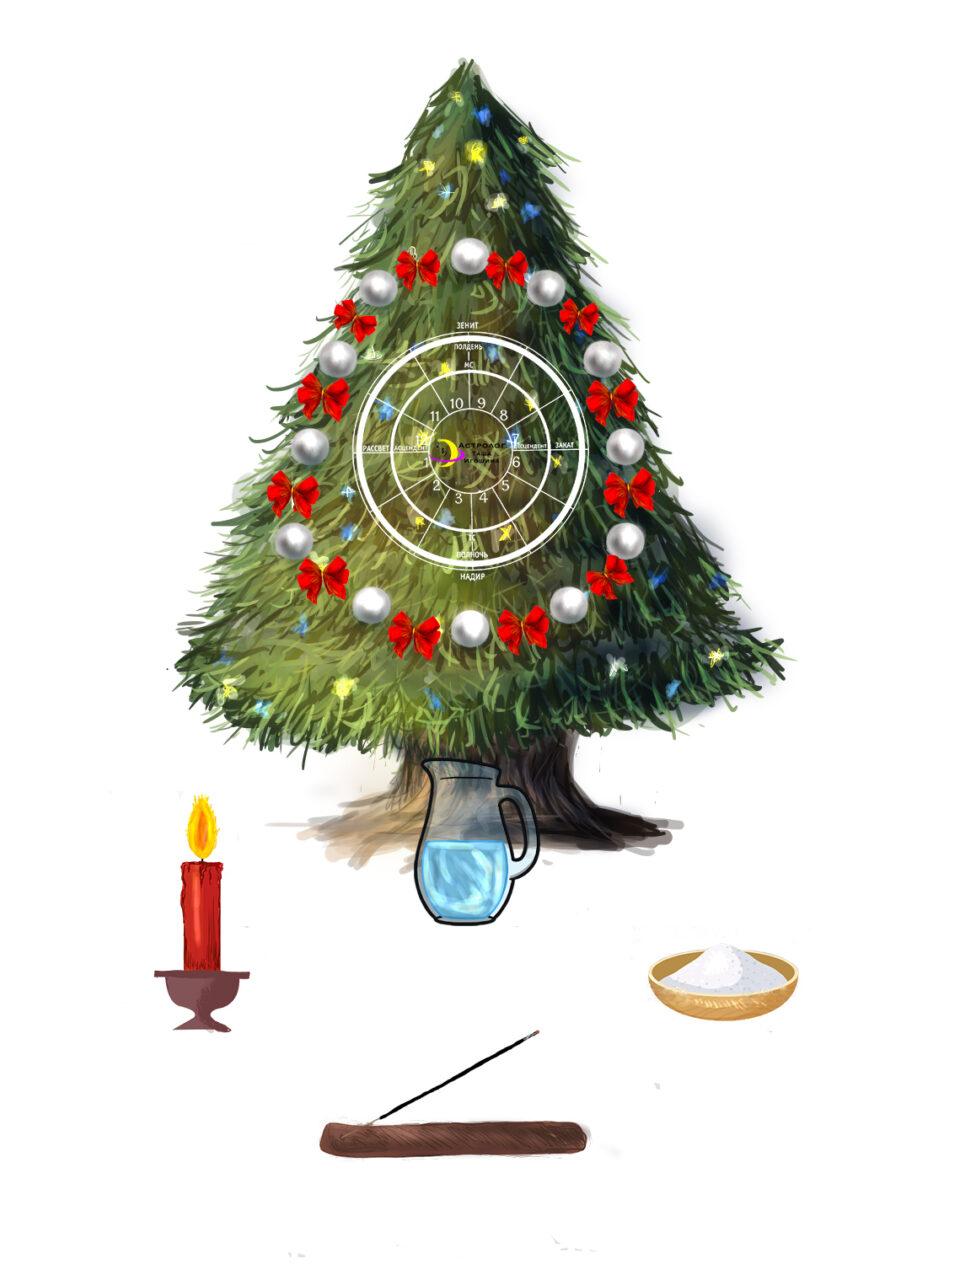 https://astrologtasha.ru/wp-content/uploads/2020/12/elka-proekt-2-ready-copy-2-960x1280.jpg